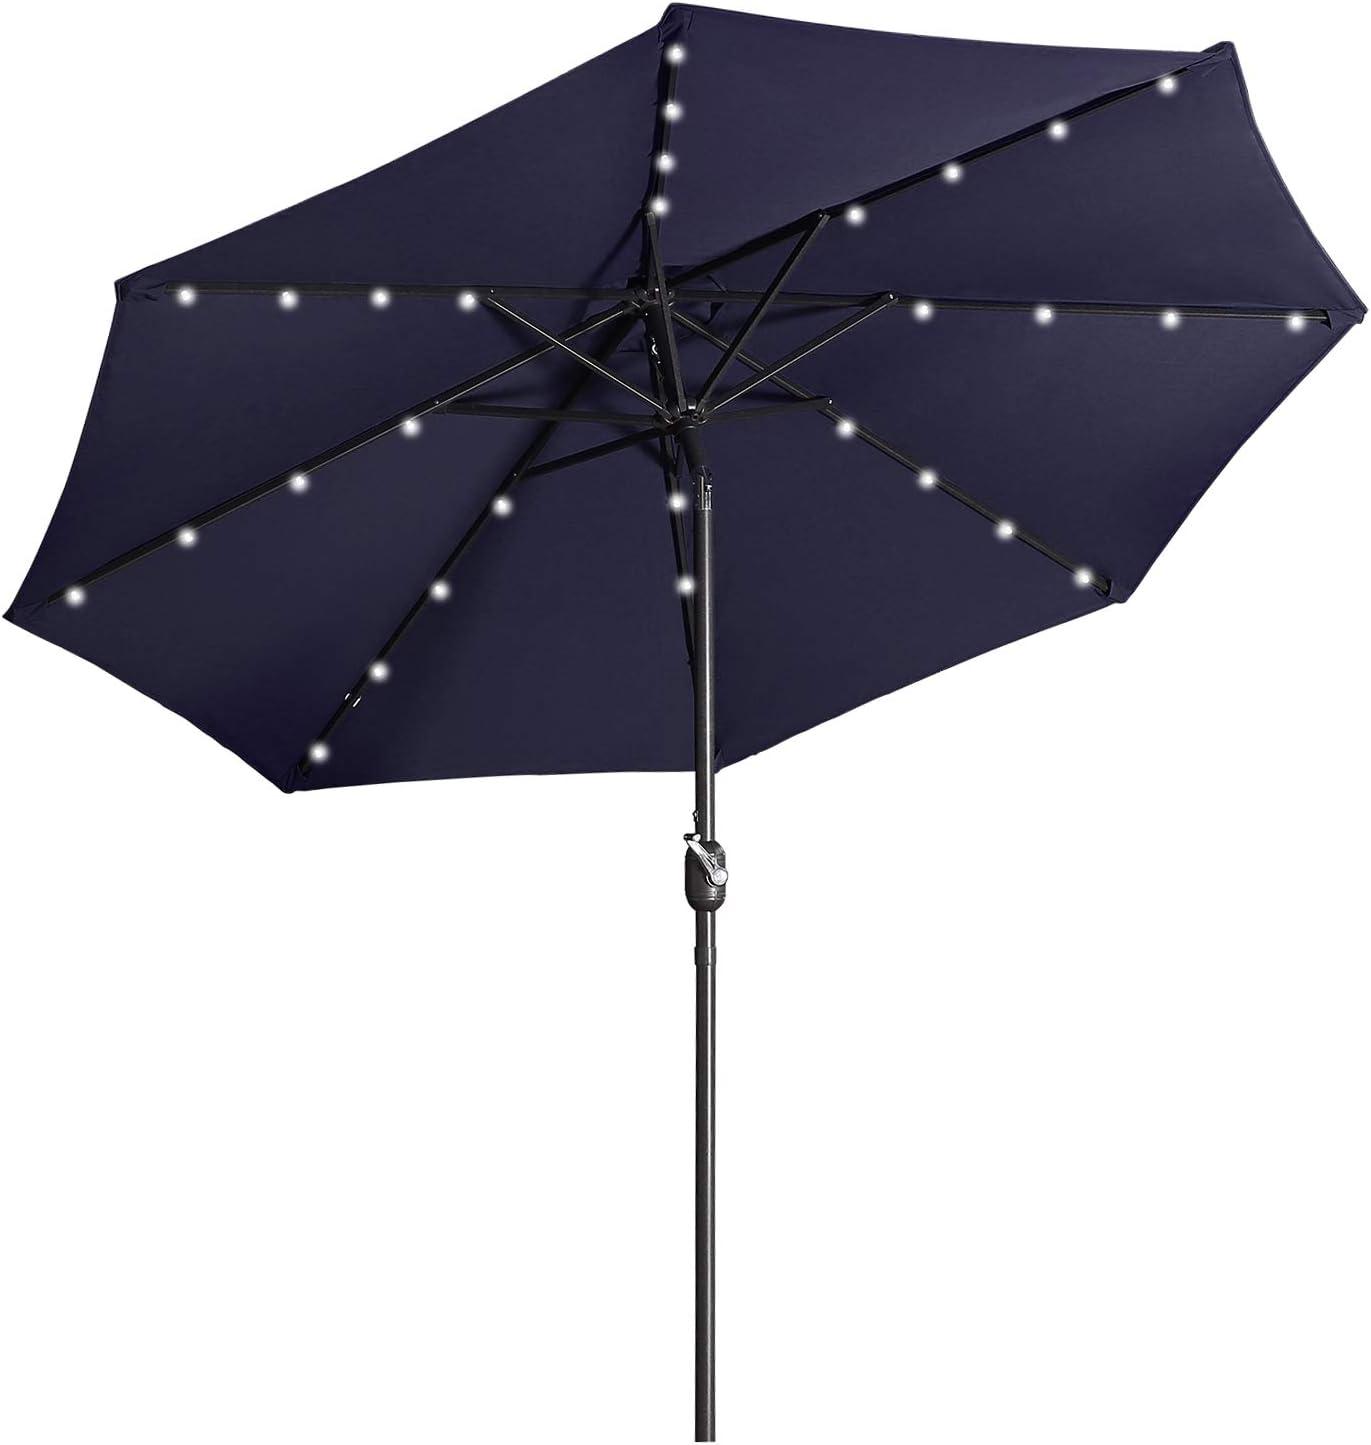 9FT Solar LED Patio Umbrella 8 Ribs Outdoor Market Beach w//Tilt Crank Sunshade